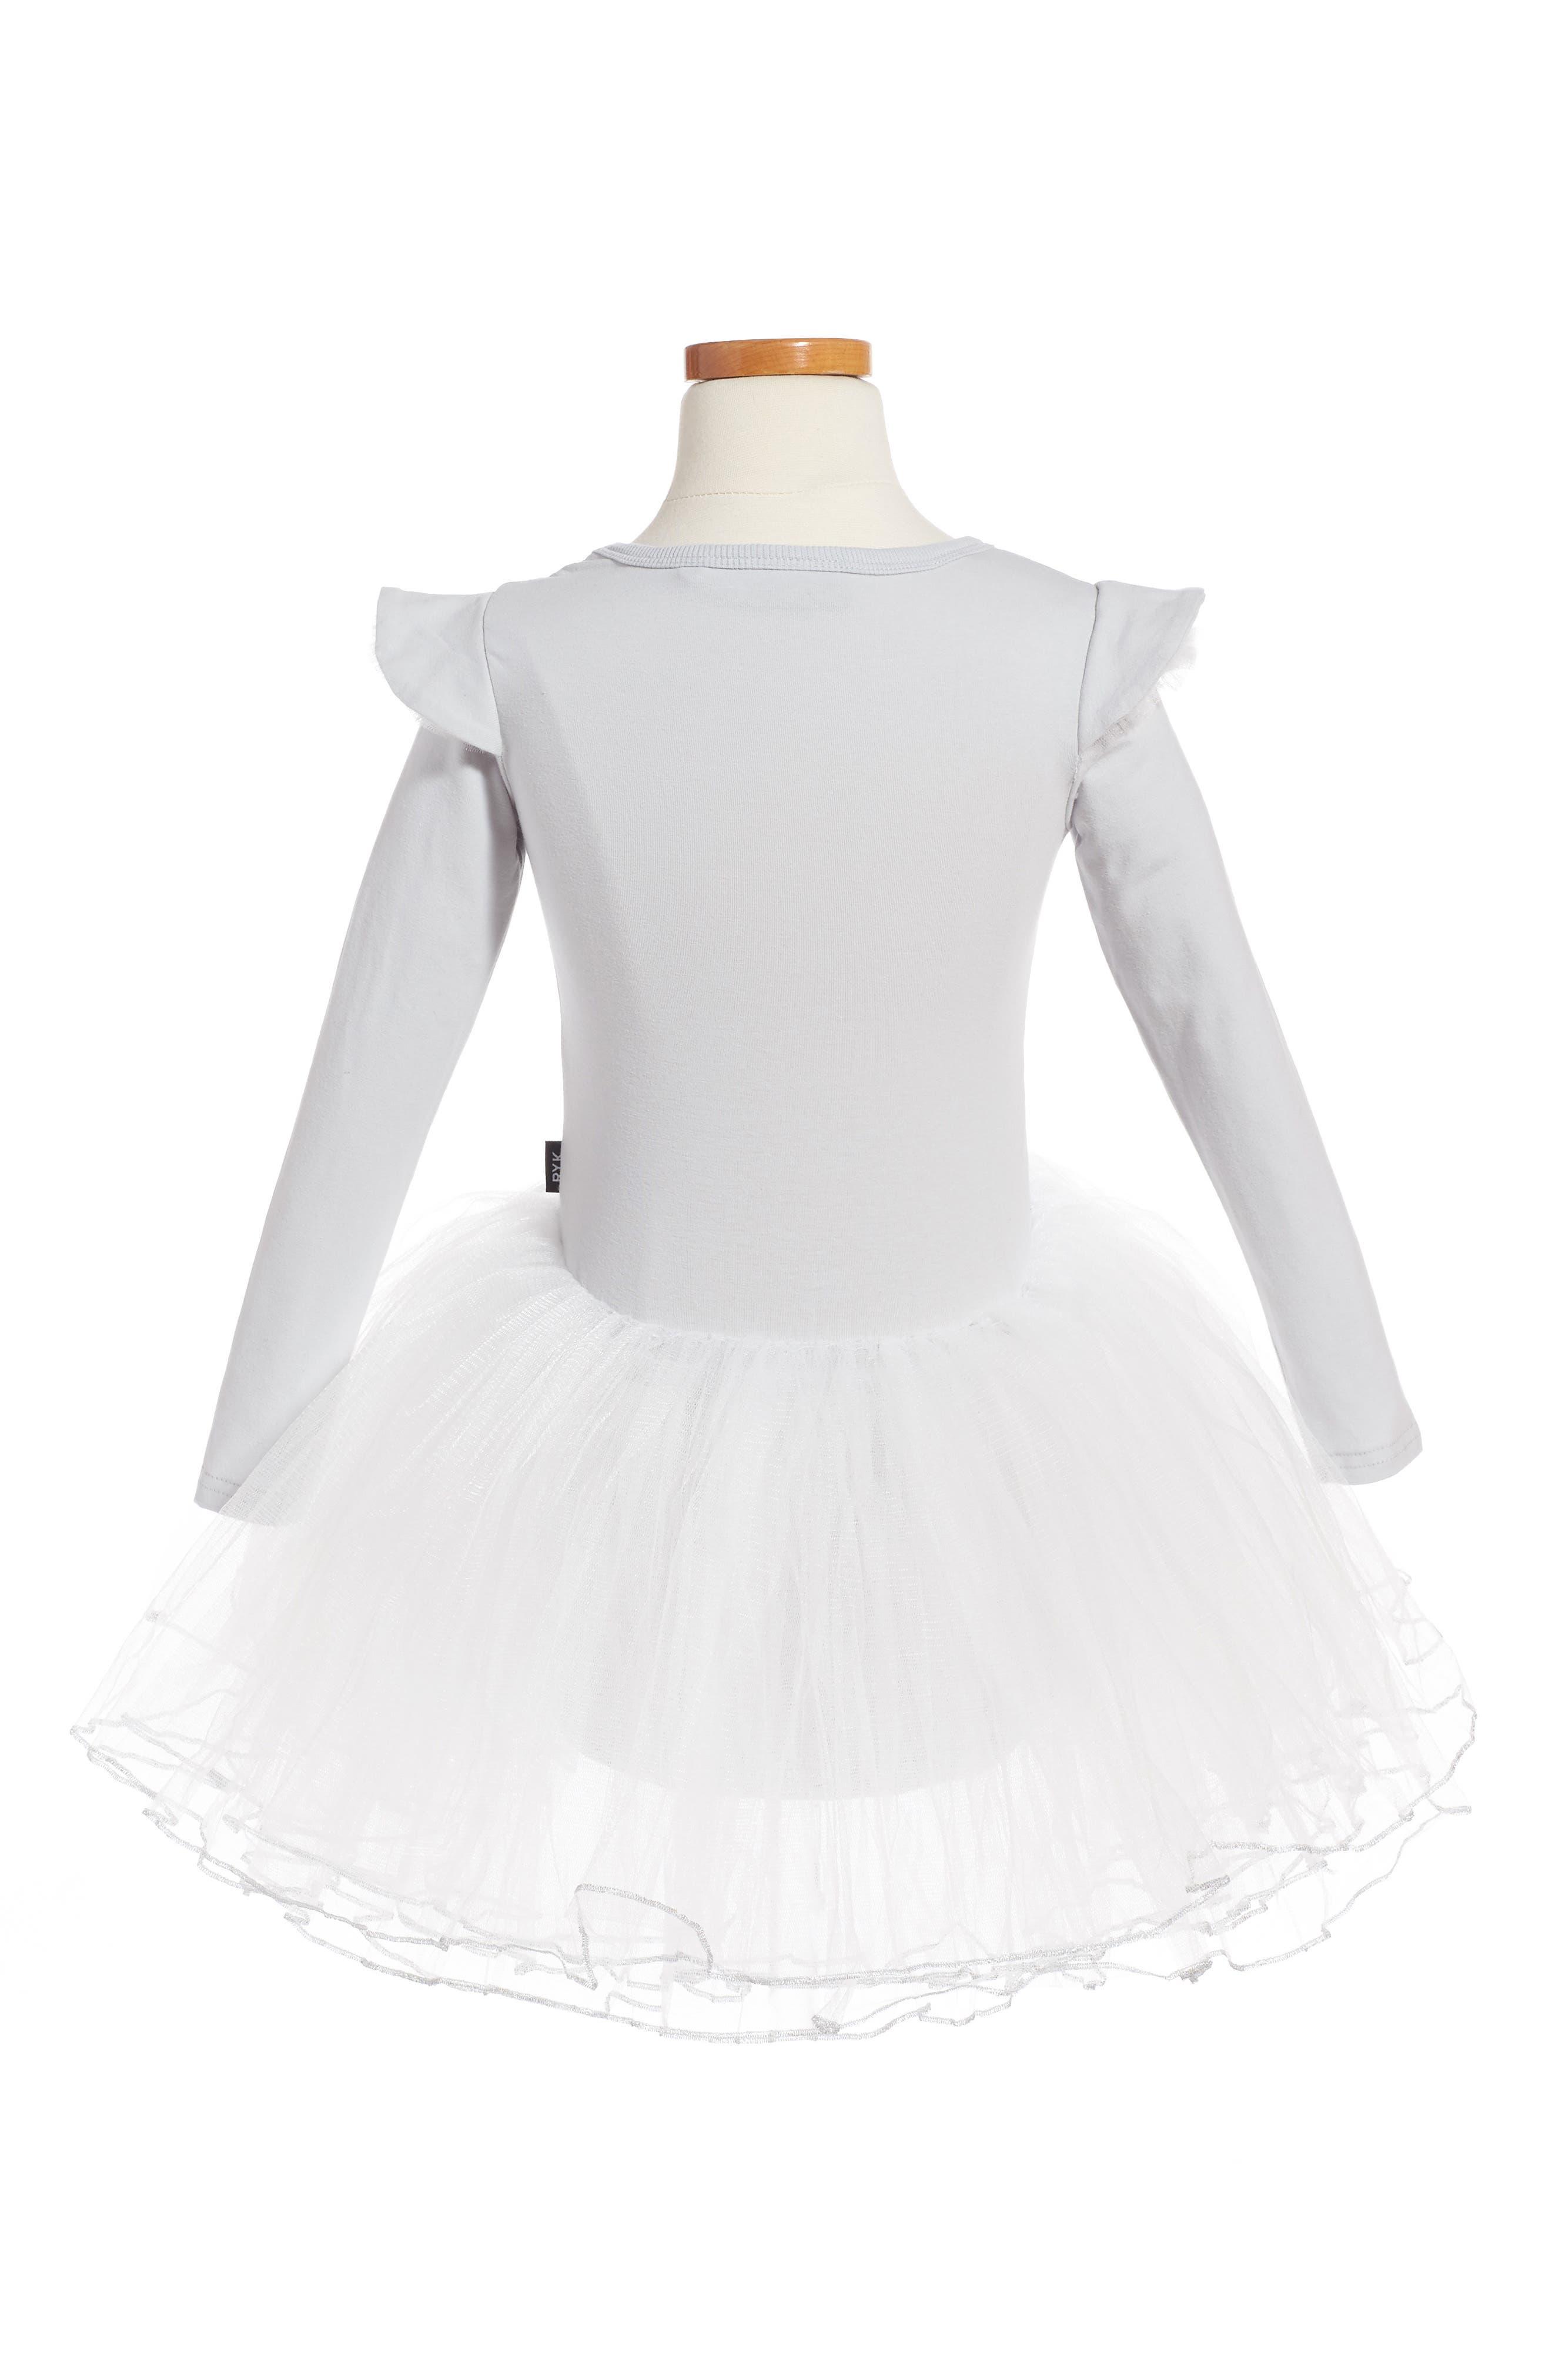 Pierrot Circus Dress,                             Alternate thumbnail 2, color,                             040